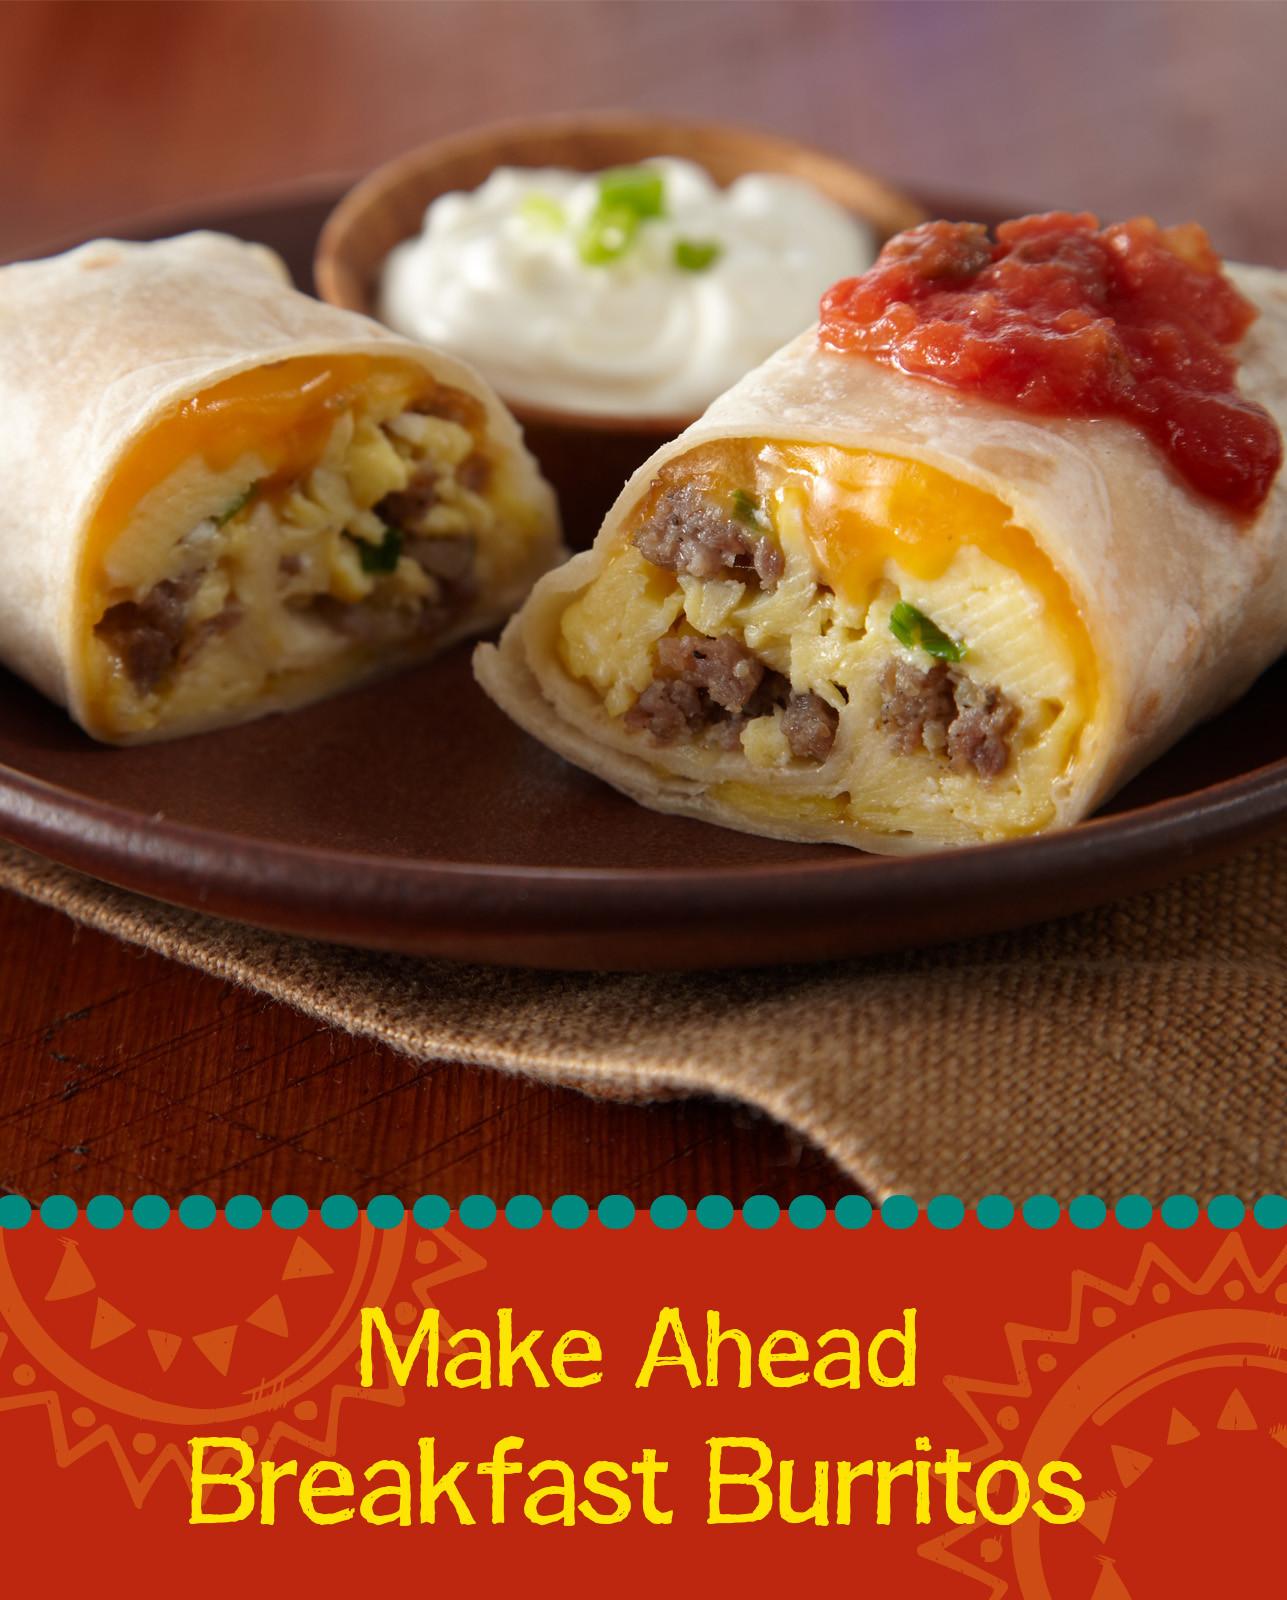 Make Ahead Breakfast Burritos  Make Ahead Breakfast Burritos